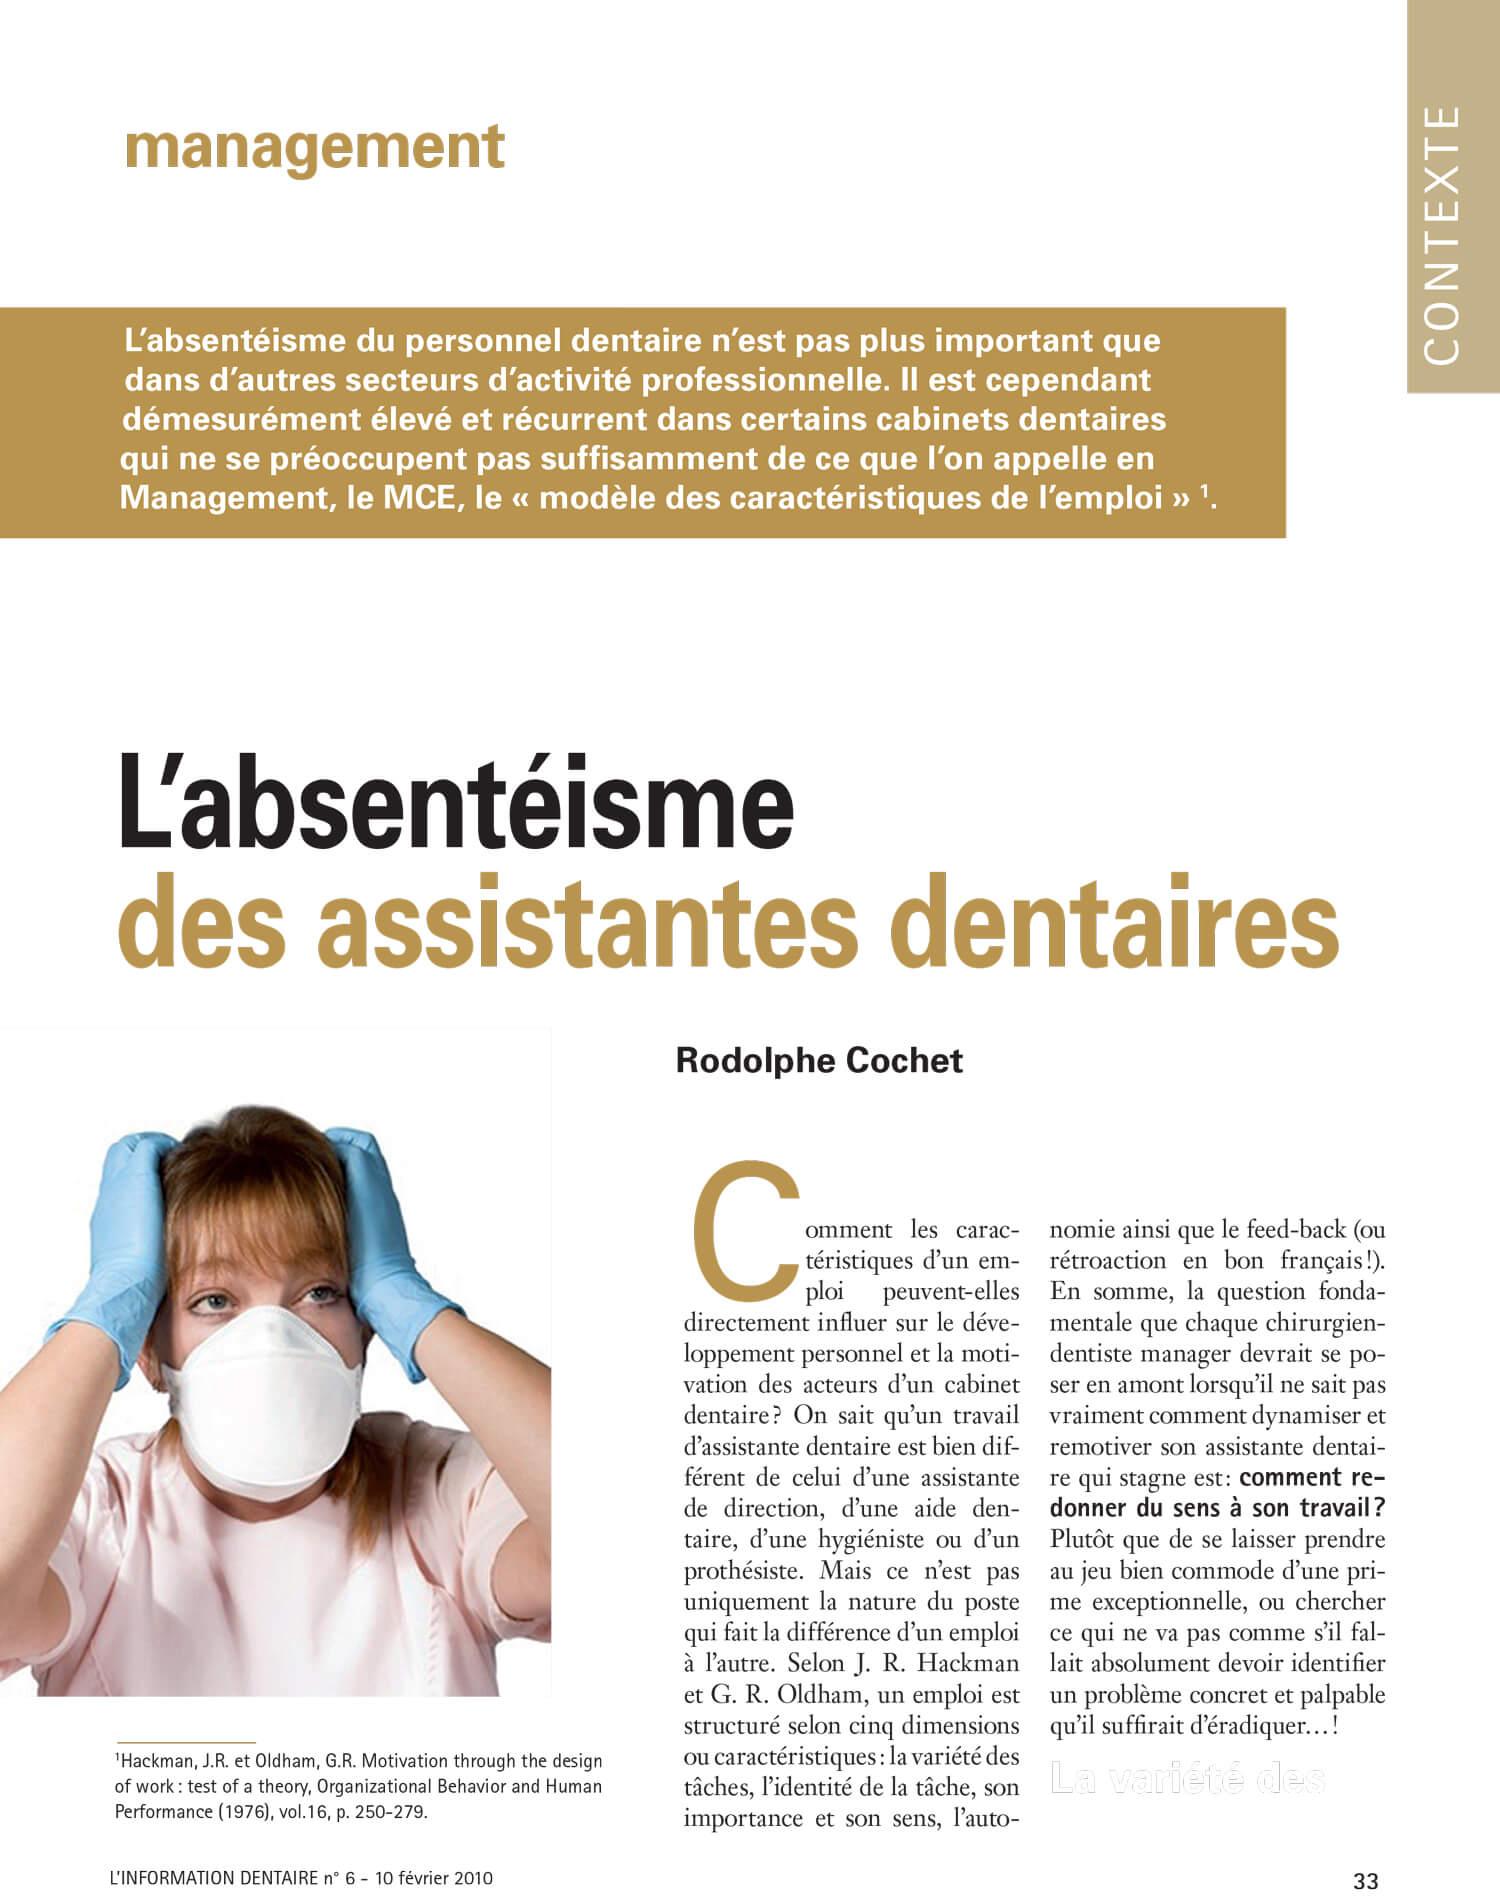 absenteisme-assistante-cabinet-dentaire-rodolphe-cochet.jpg